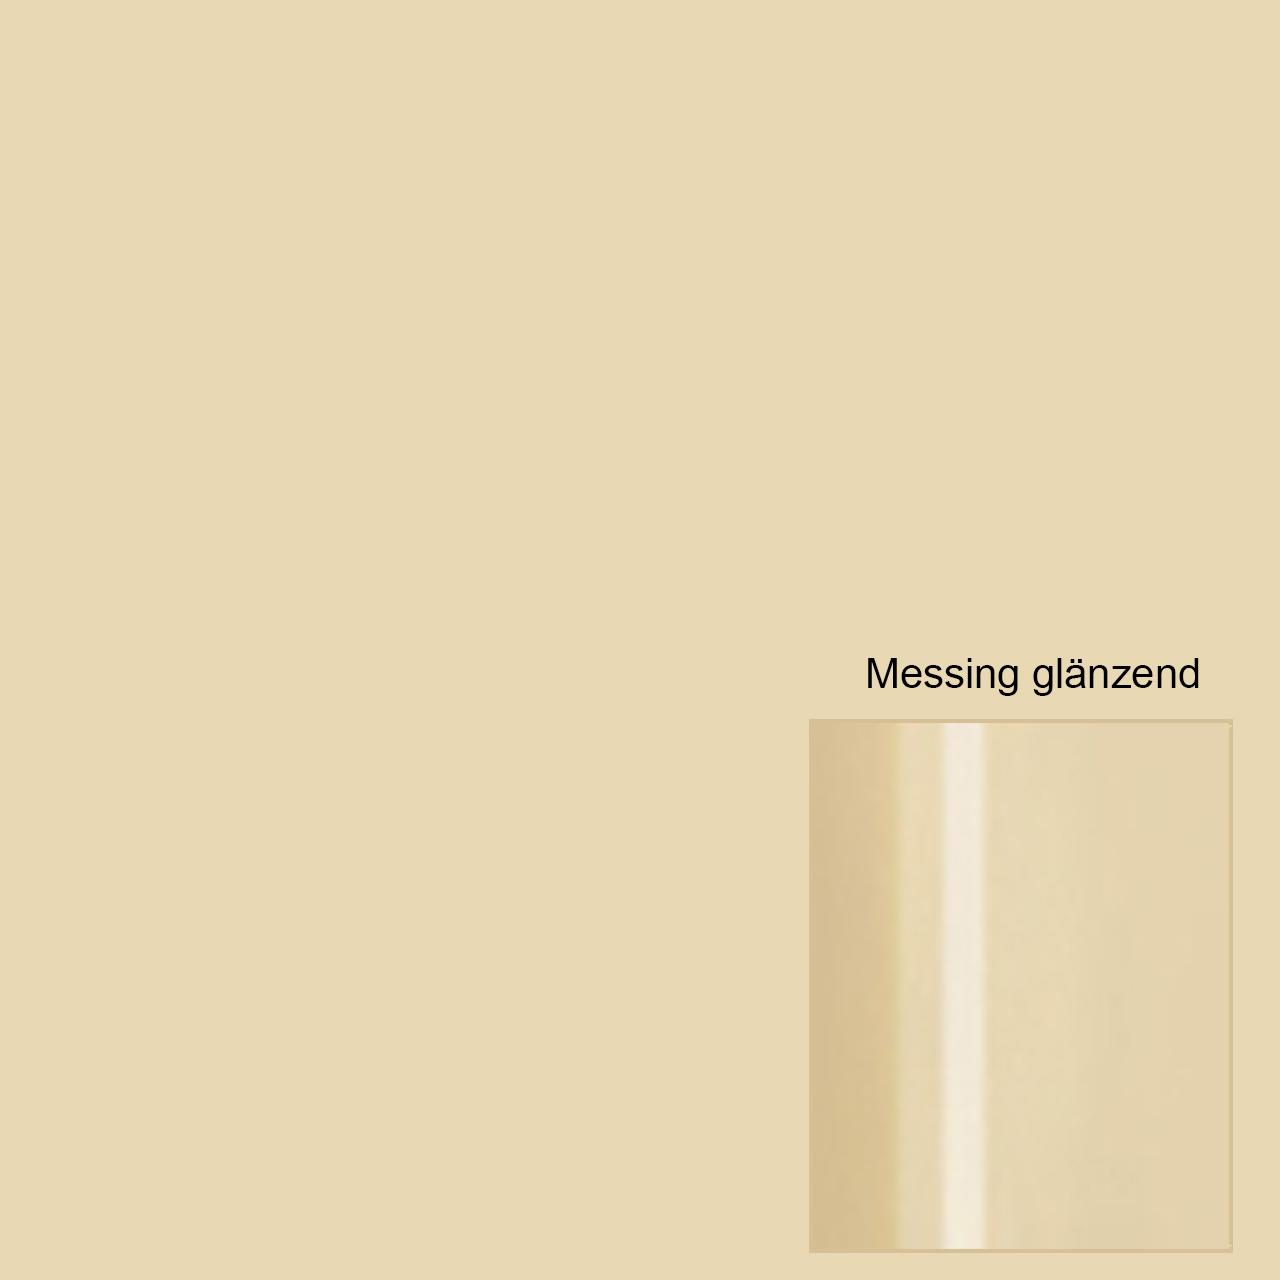 Messing-gl-nzend